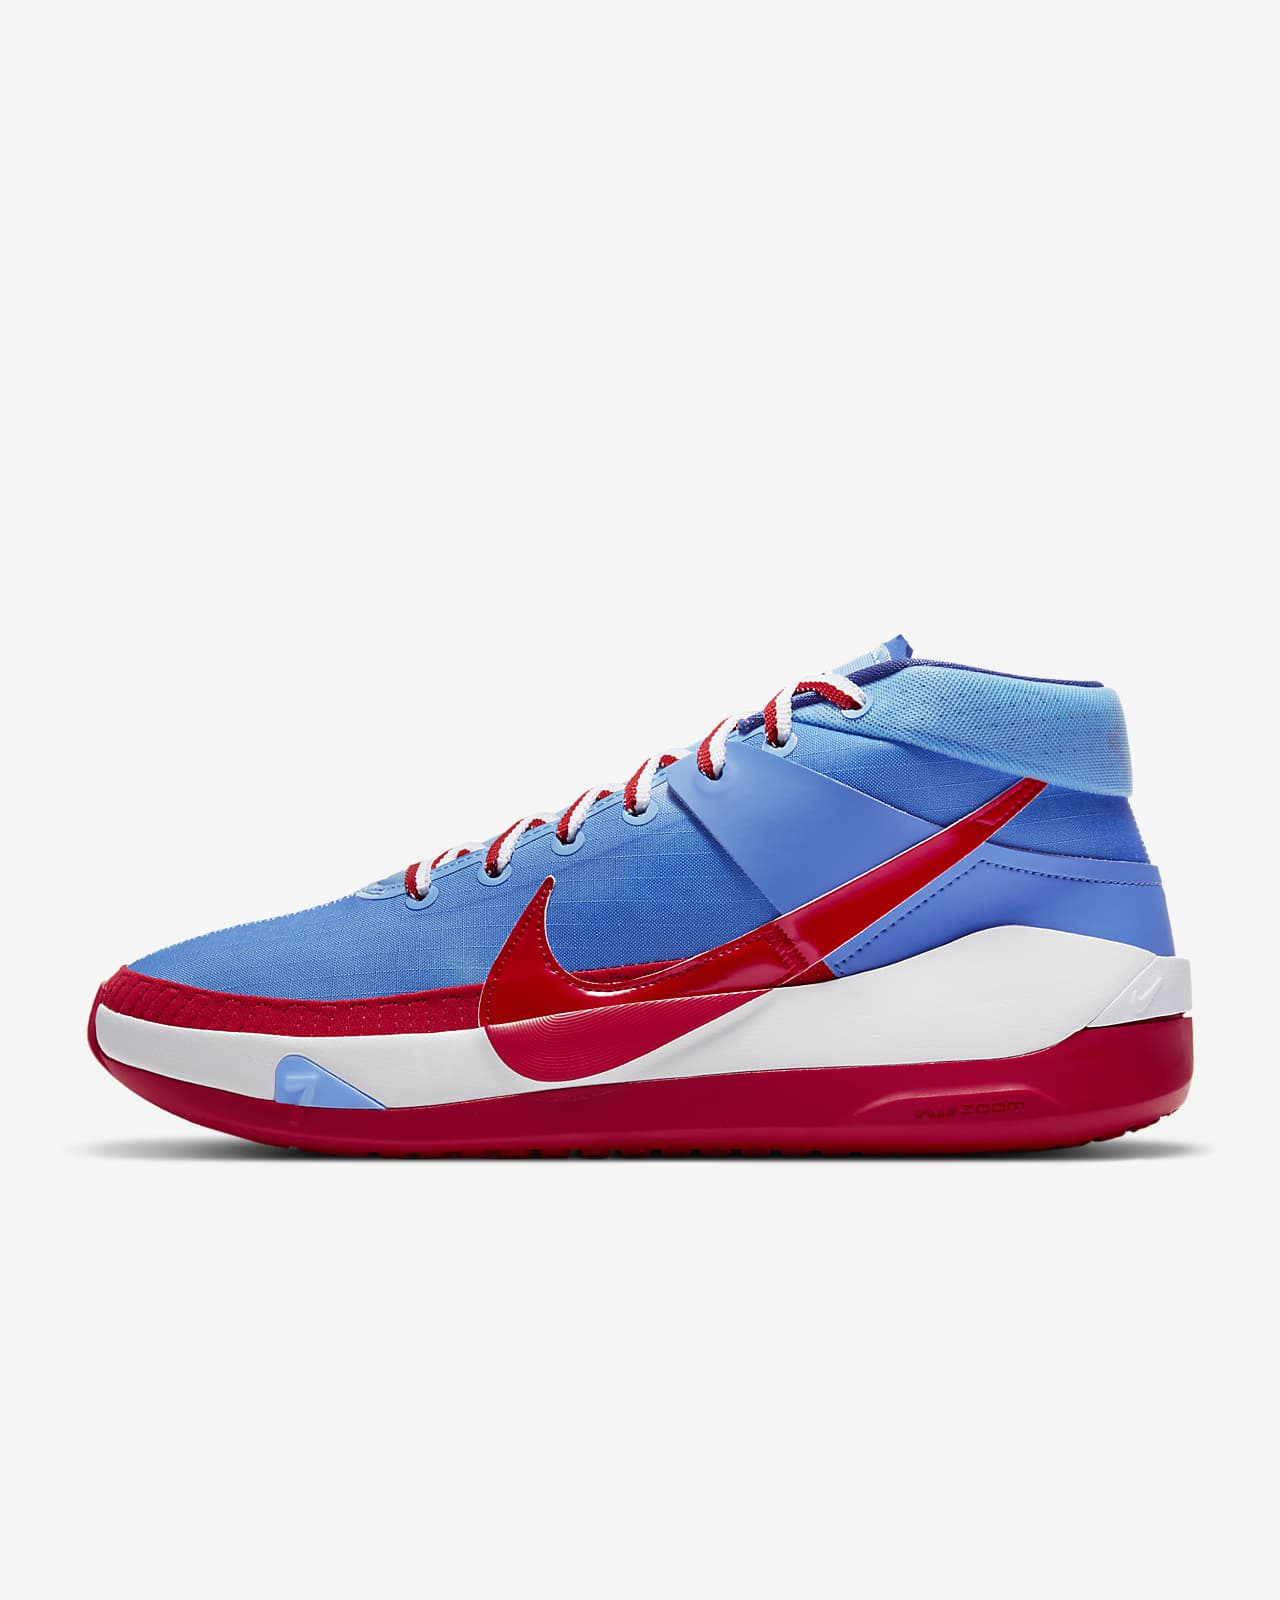 KD13 EP 籃球鞋